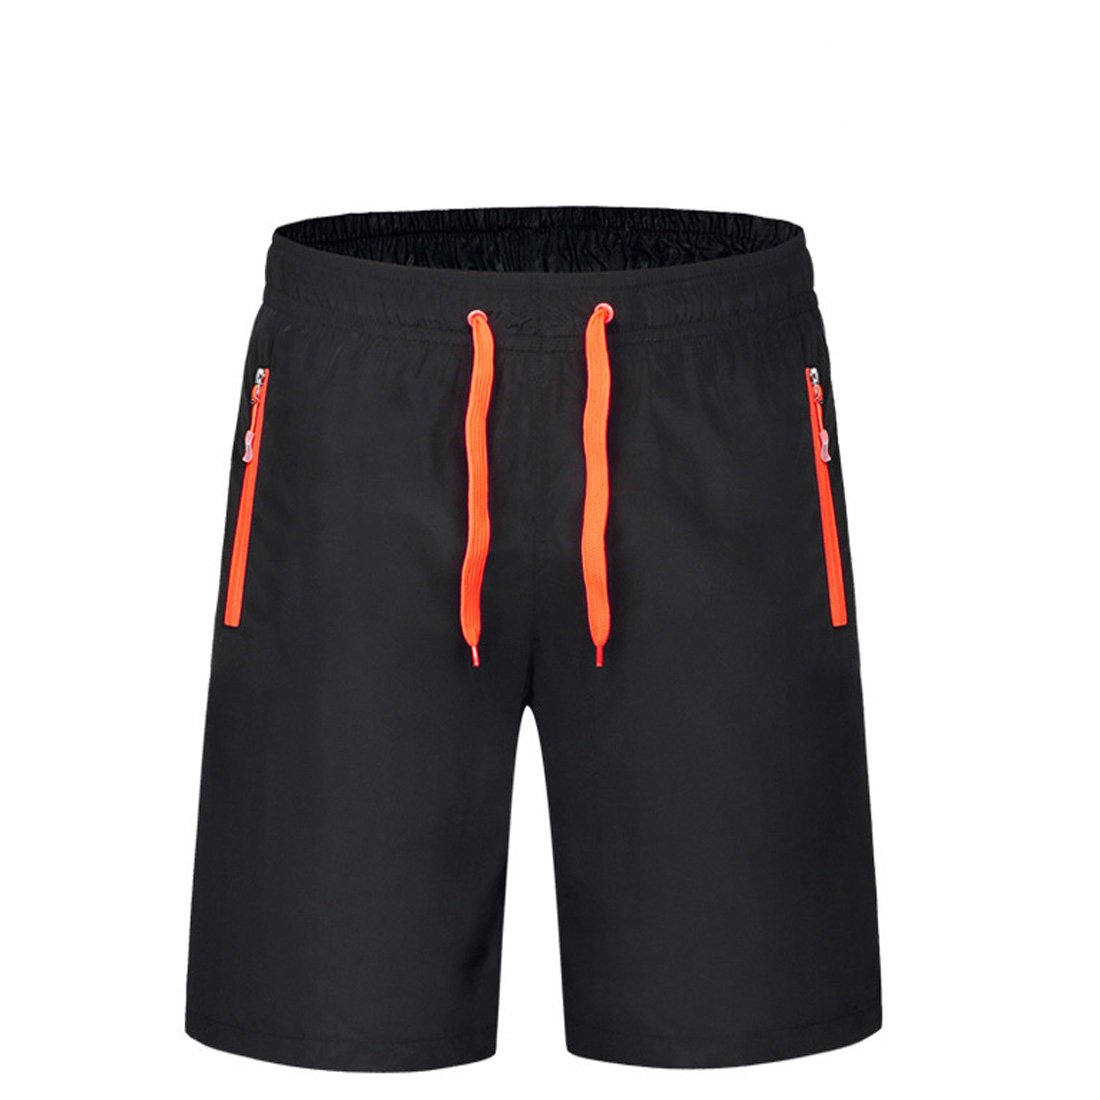 Sidiou Group Pantalones cortos deportivos para hombres Shorts finos de verano Quick Dry Pantalones de running transpirables Fitness Trianing Short Pantalones casuales Poliéster